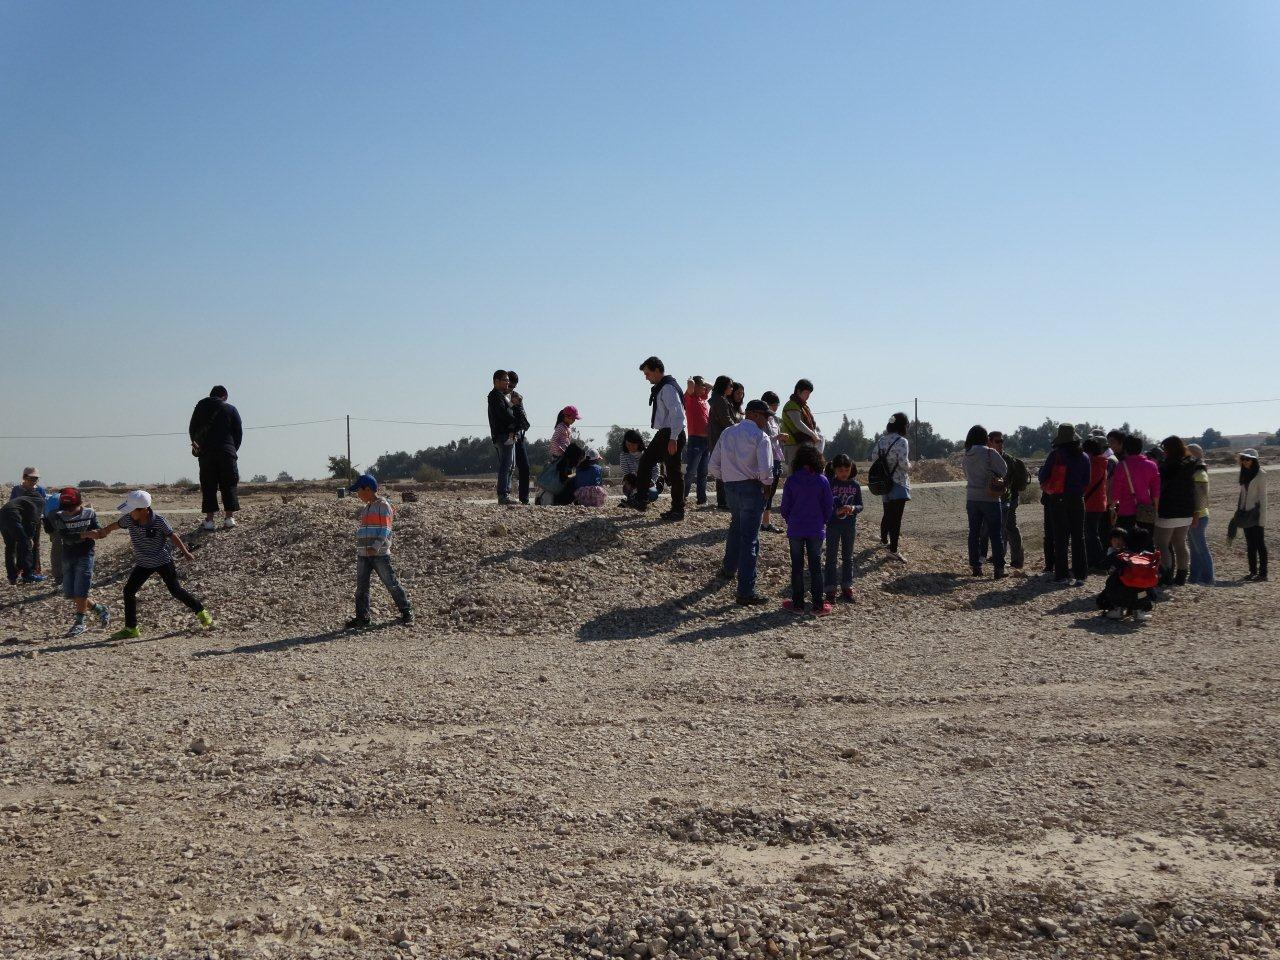 Graffiti wall chelmsford - Bahrain Archeology Research Group Fieldwork Presentation